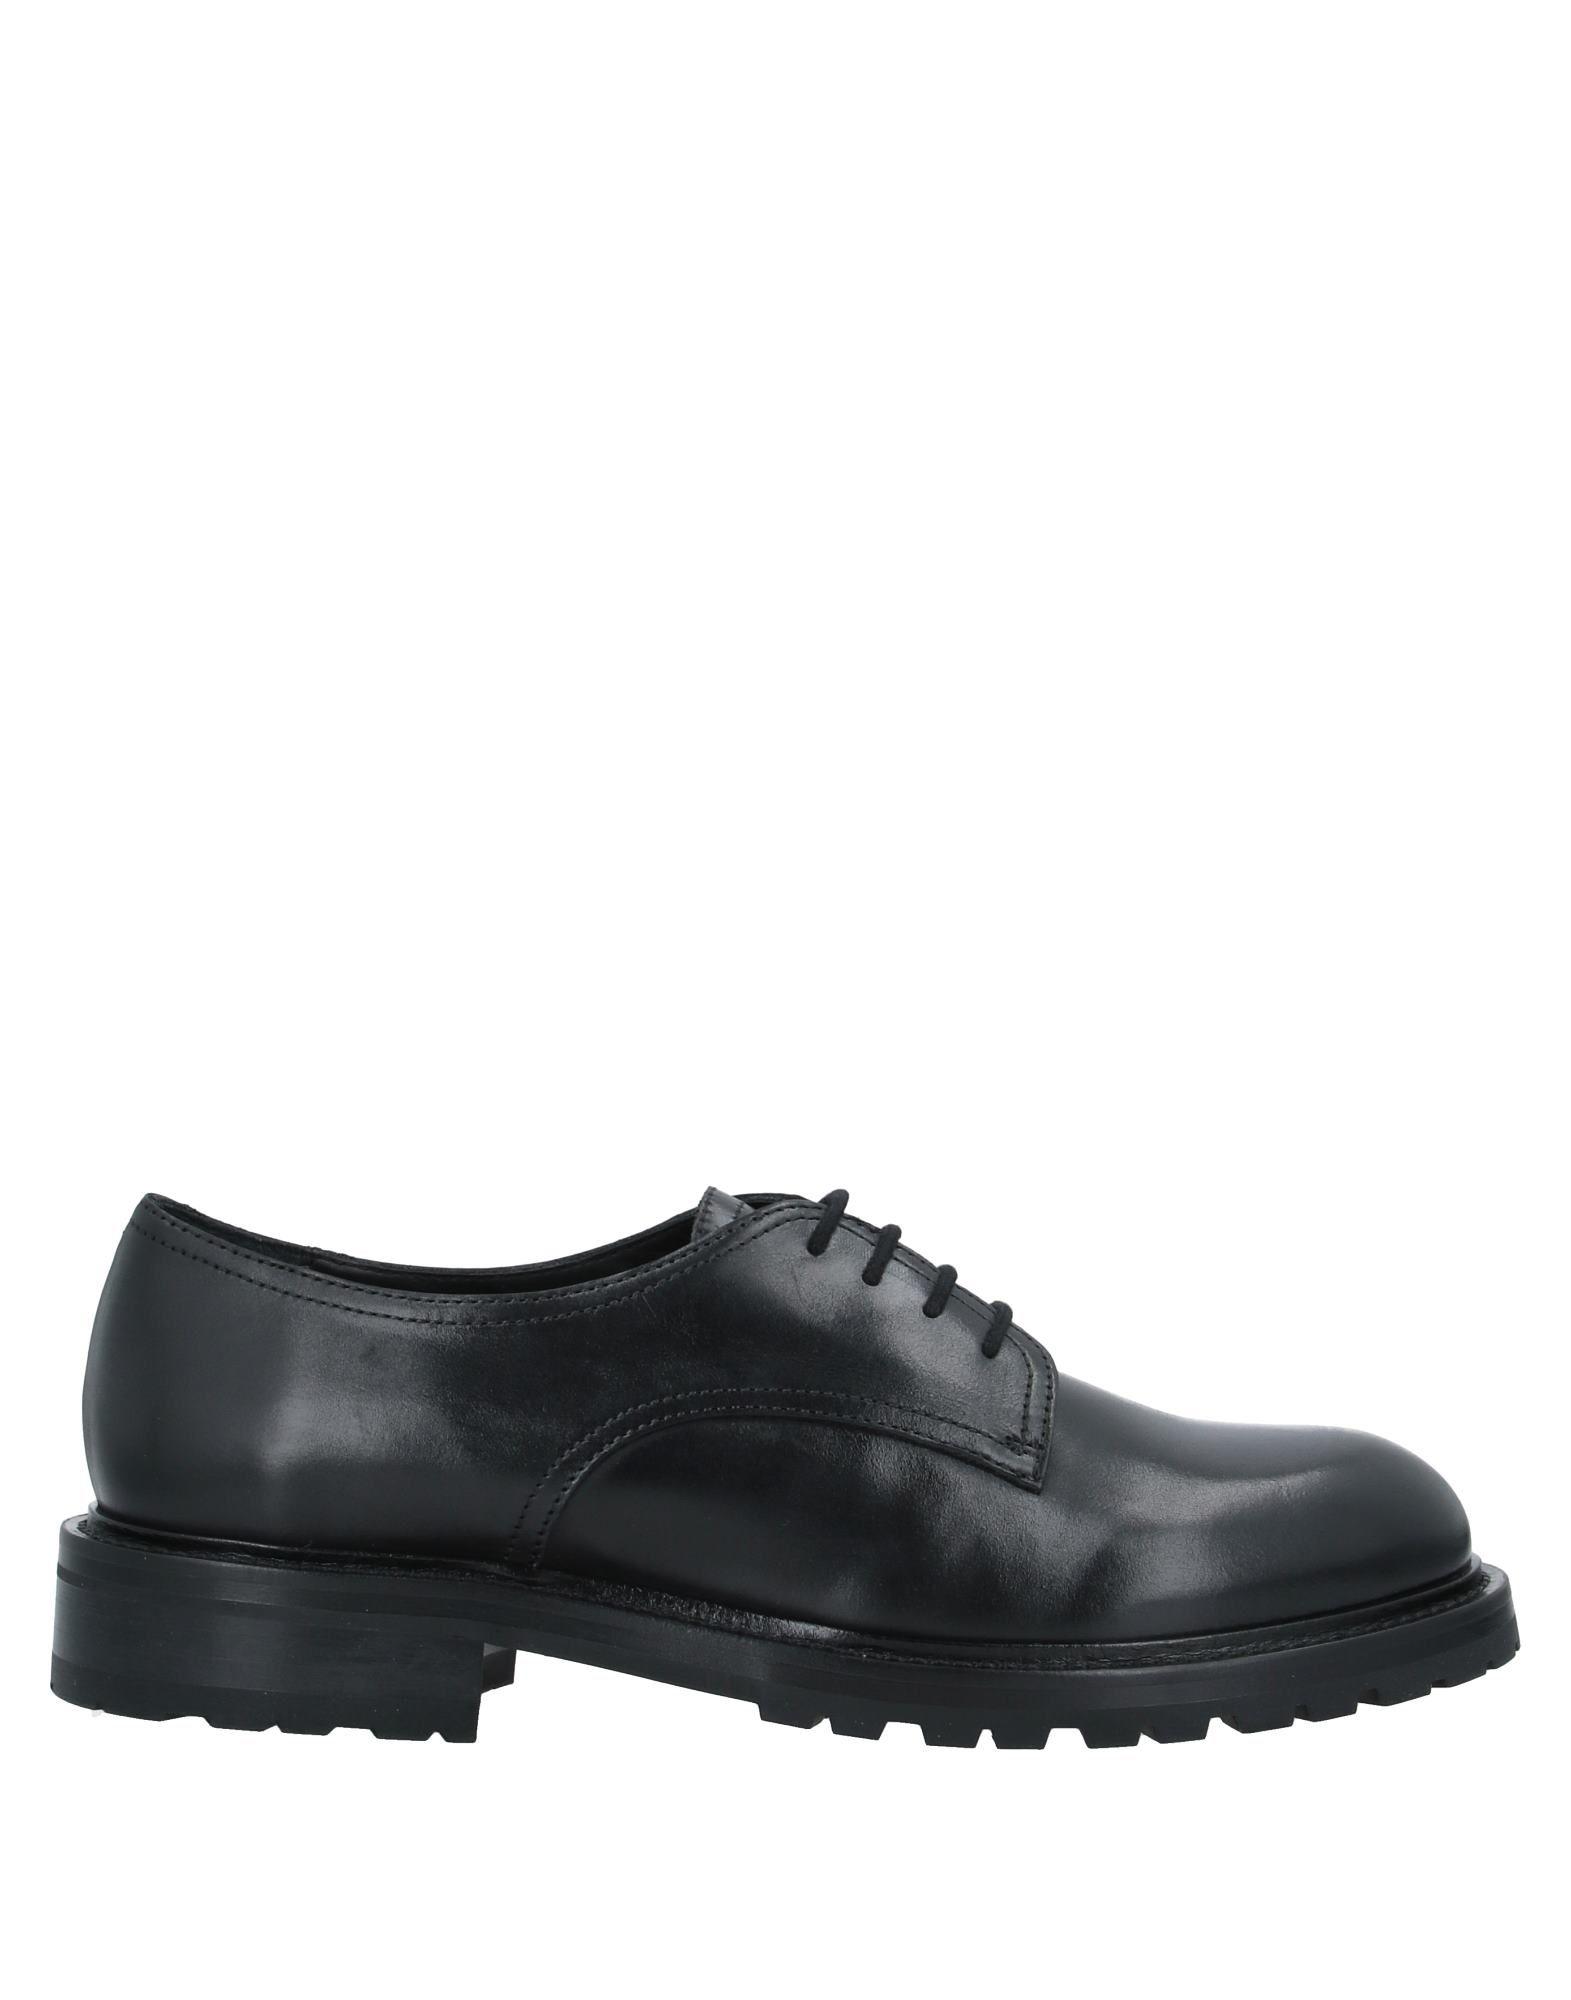 DIESEL BLACK GOLD Обувь на шнурках diesel обувь на шнурках